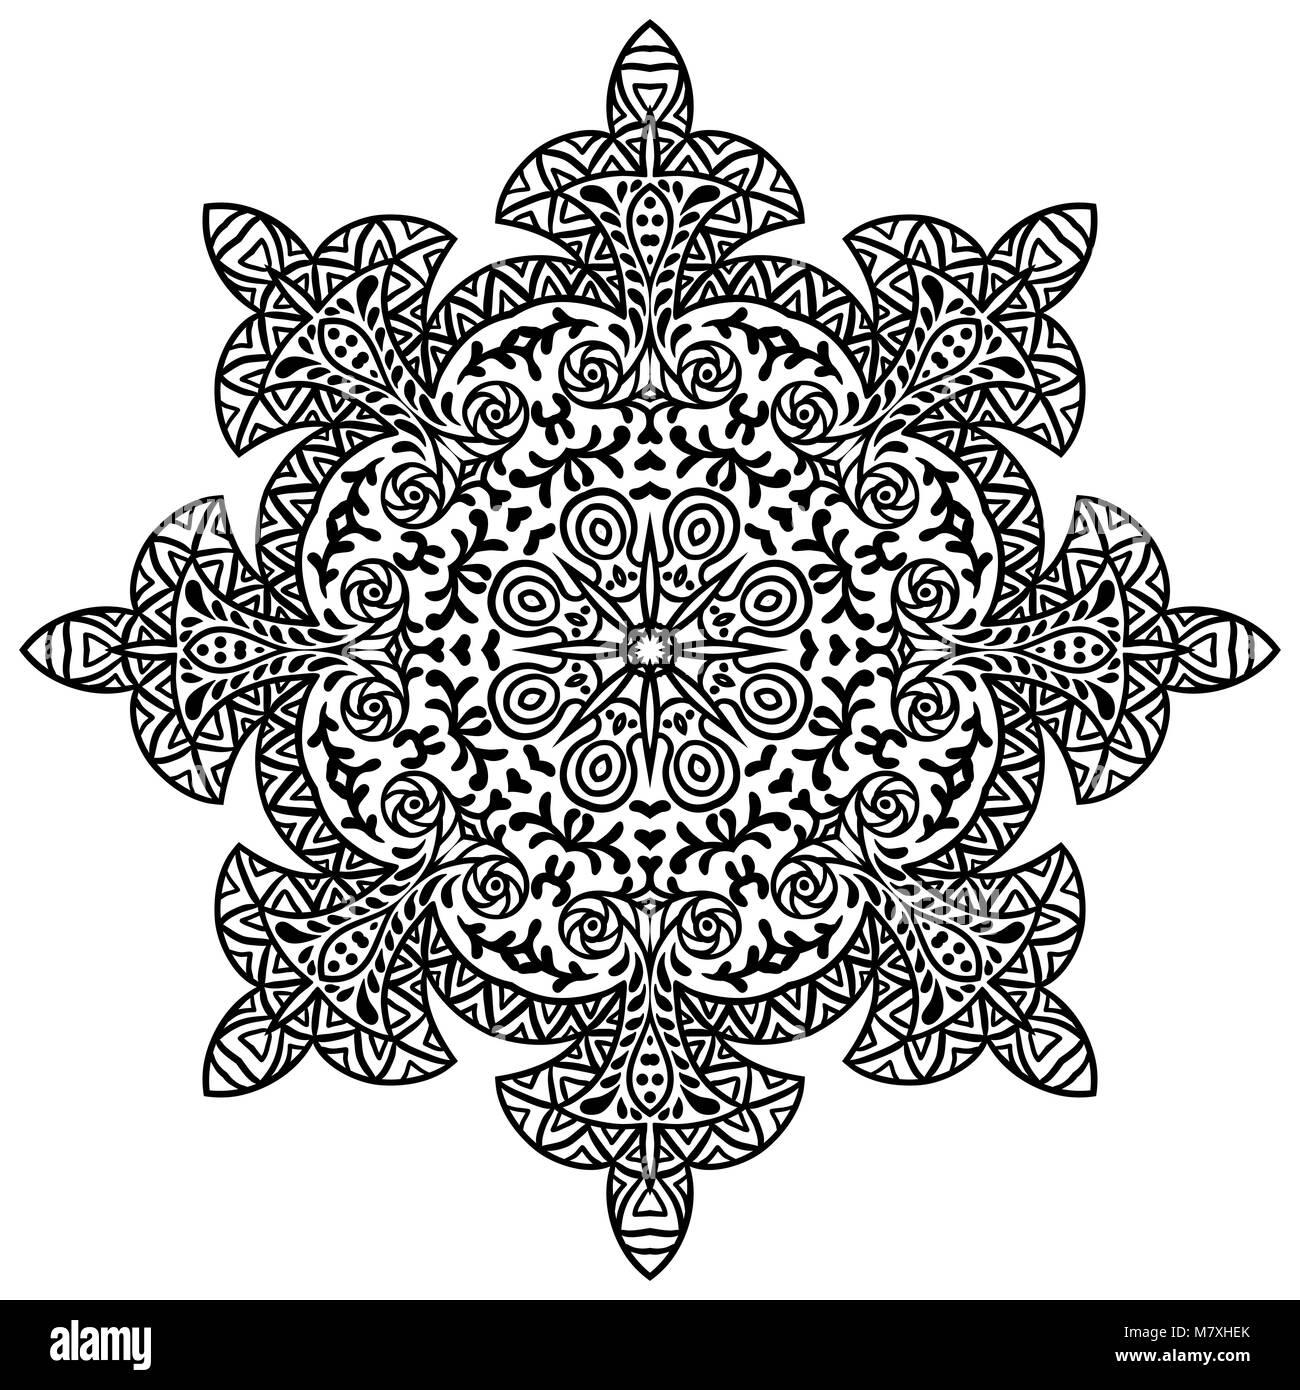 b825ea05a4906 Indian ethnic round ornament. Mandala. Hand drawn henna tattoo decorative  element